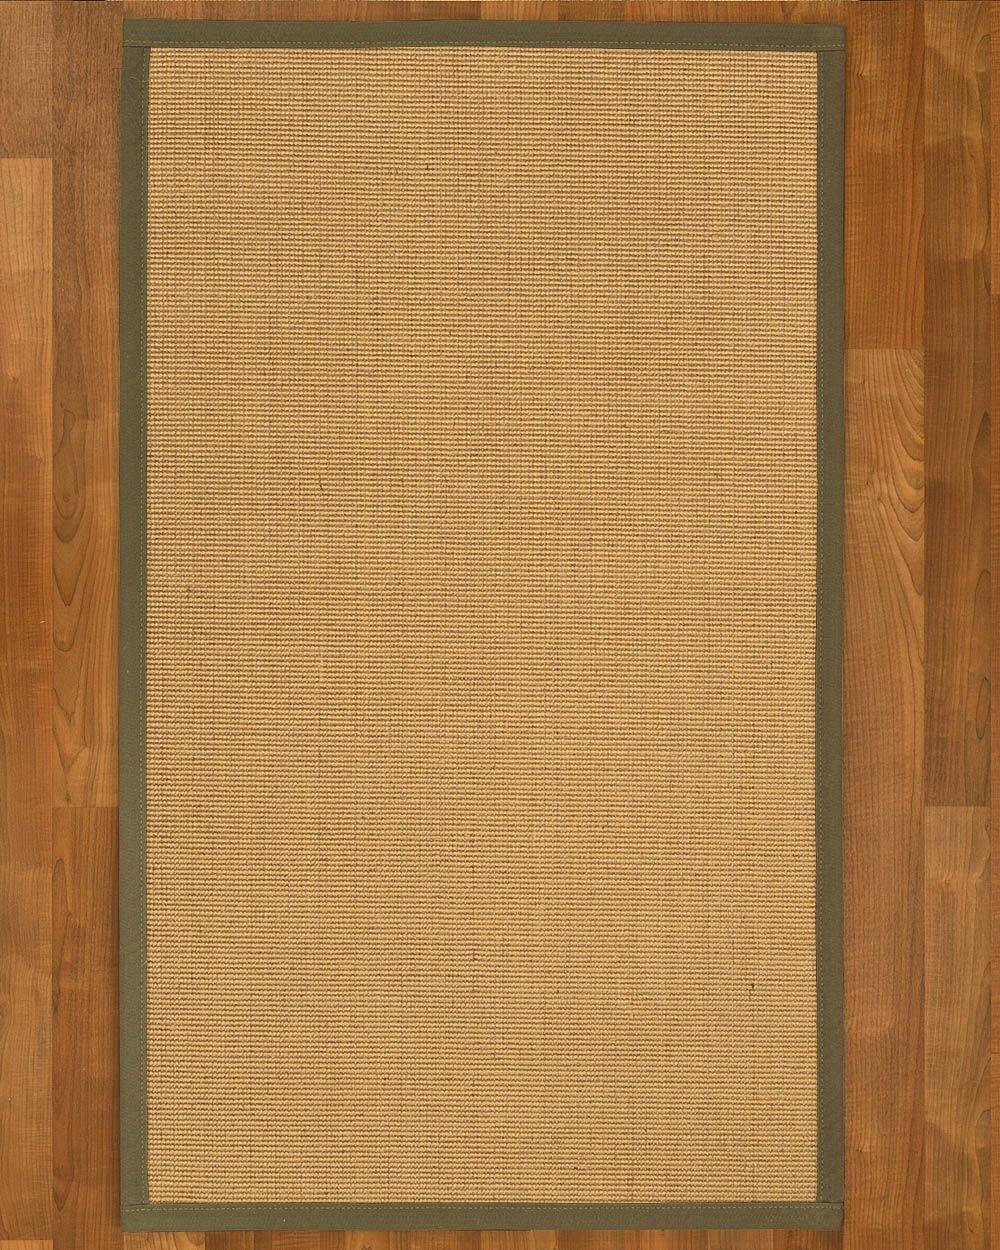 Lanie Hand-Woven Beige Area Rug Rug Size: Runner 2'6